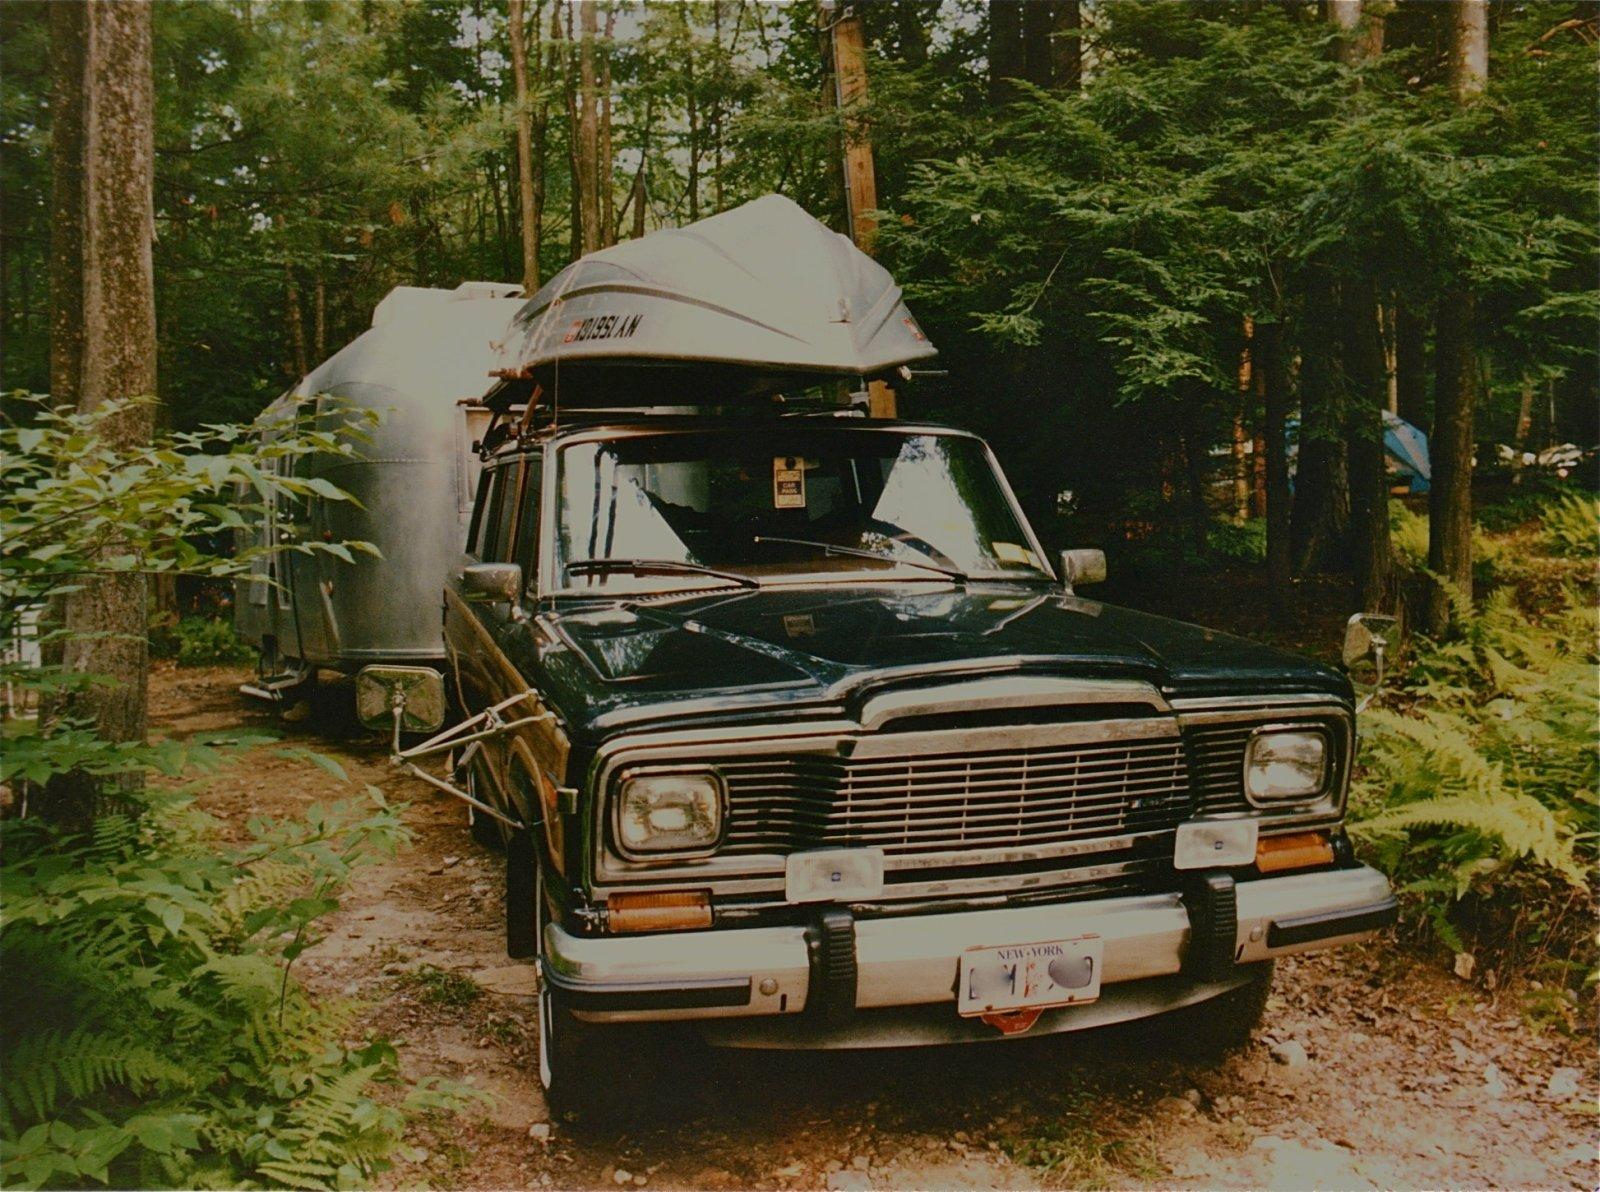 Click image for larger version  Name:Safari Boat Camping.jpg Views:95 Size:404.1 KB ID:198095